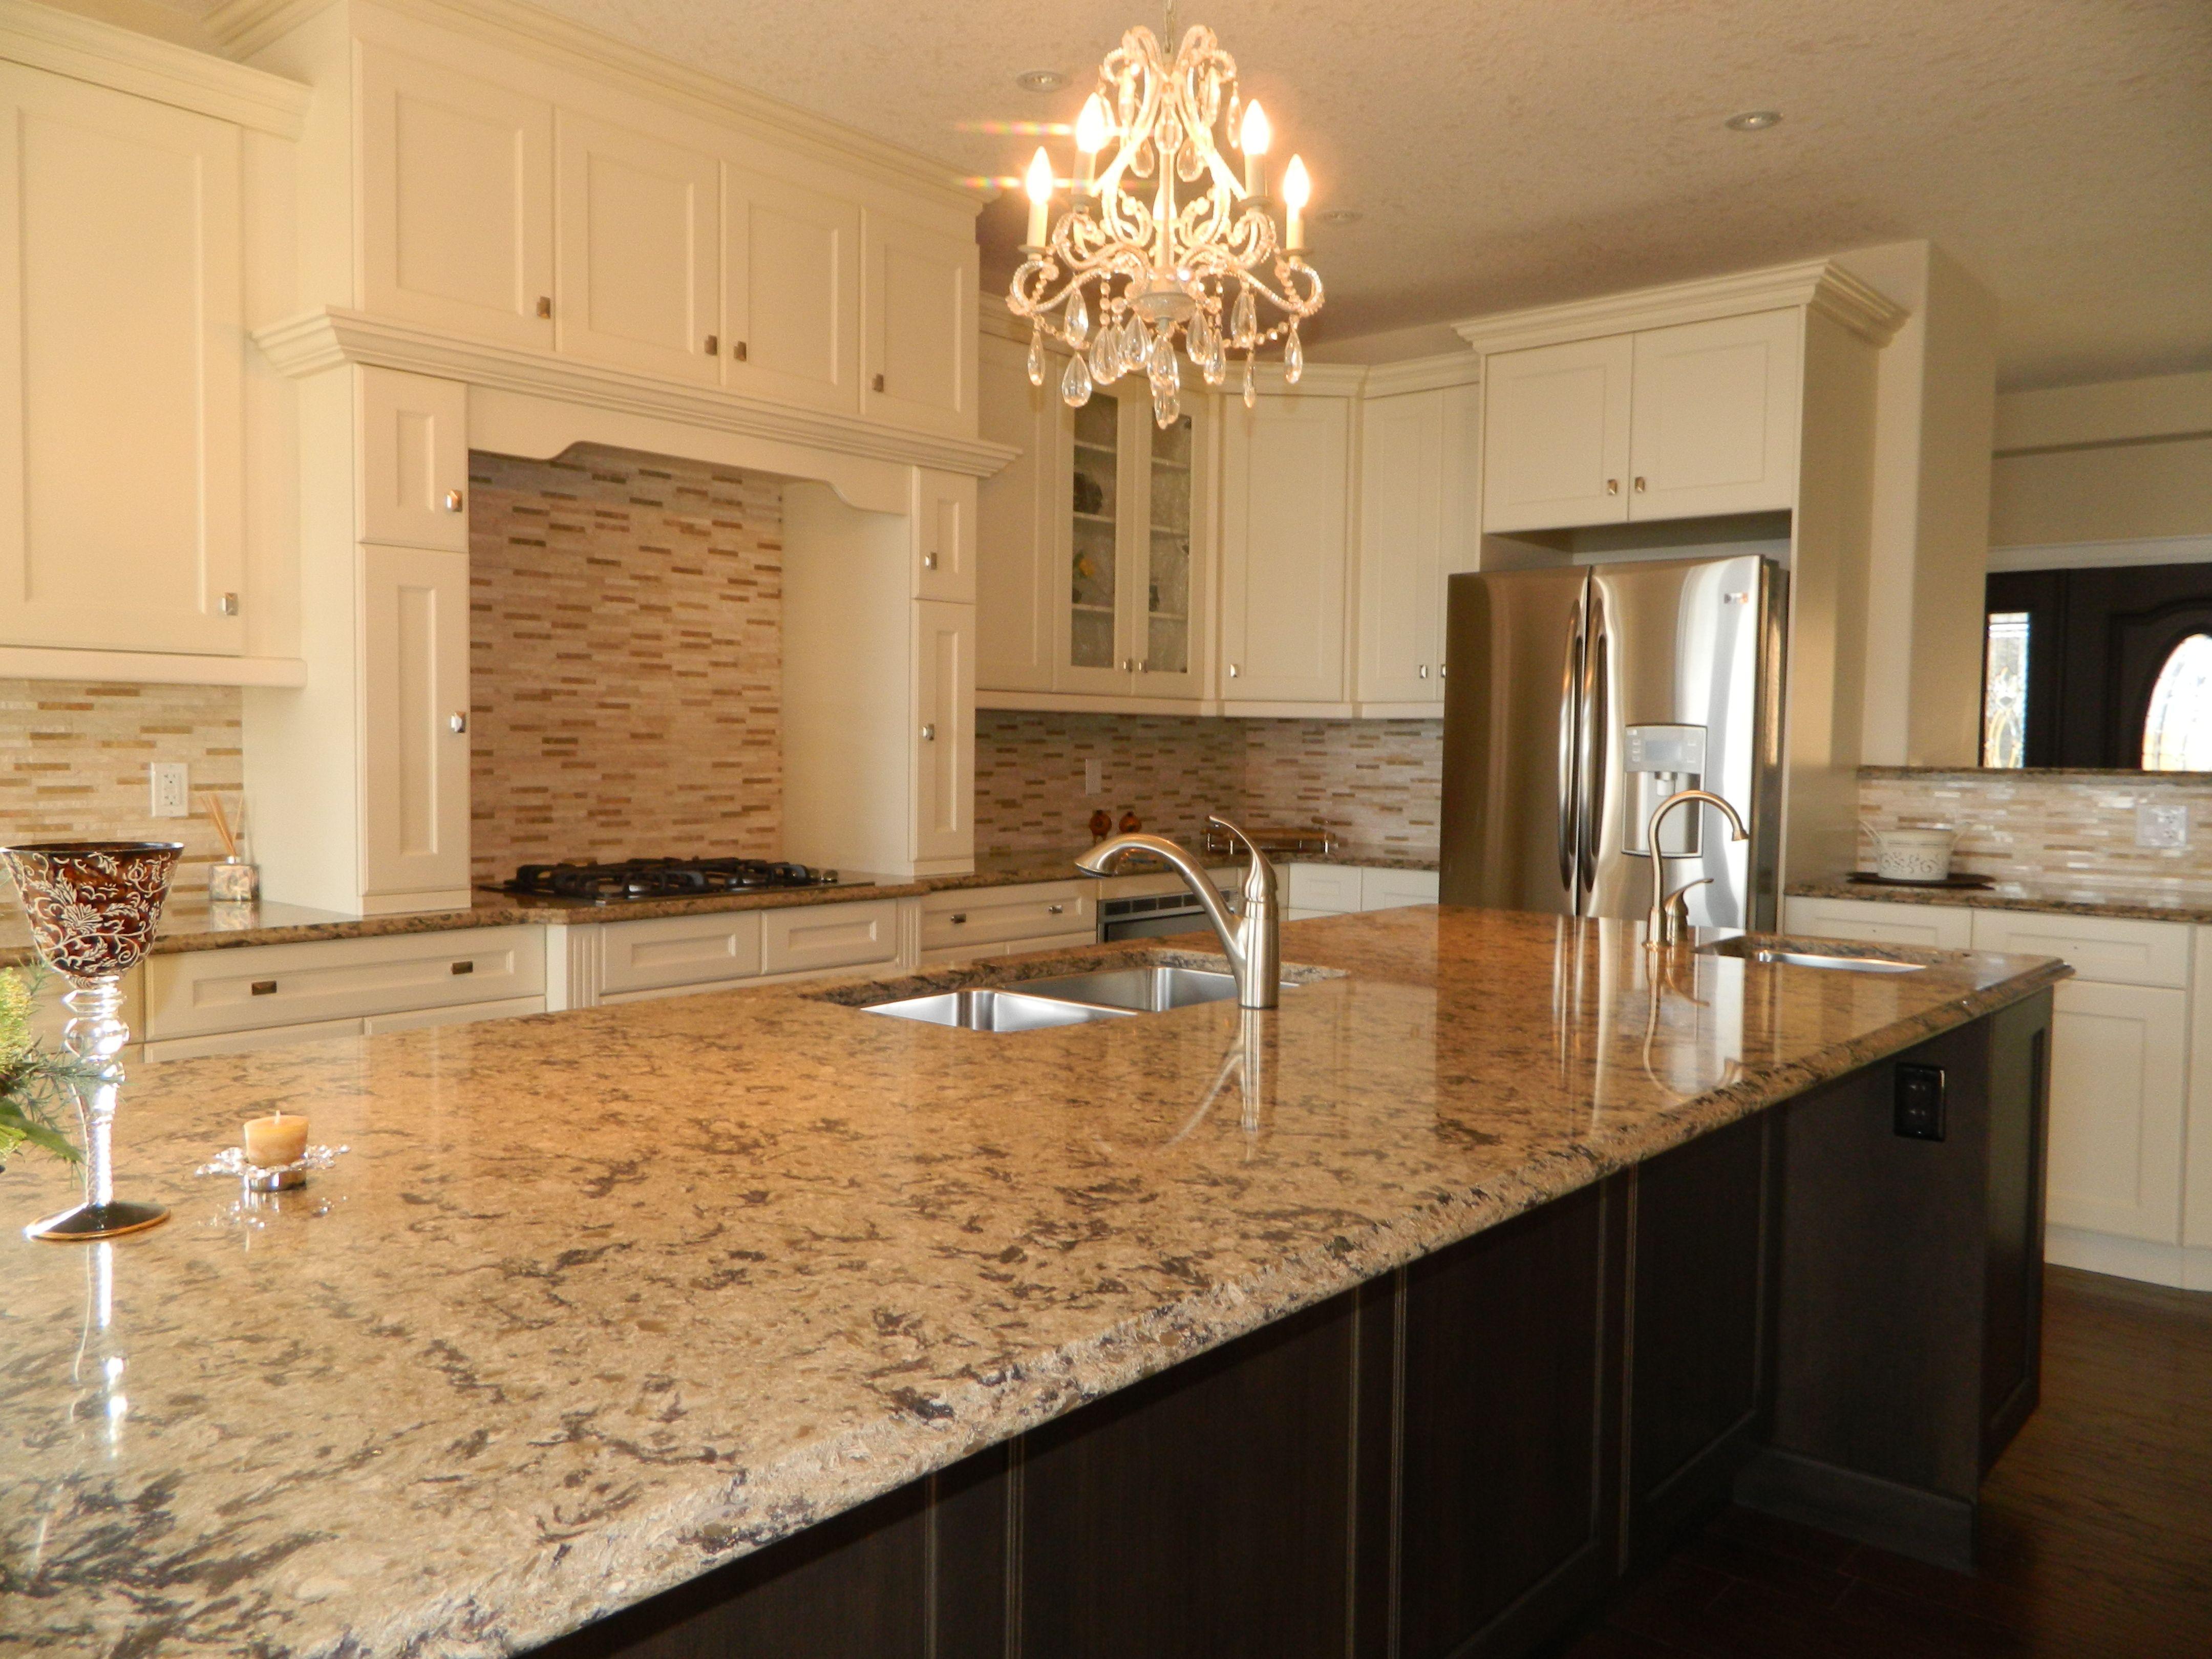 quartz kitchen countertops portable ventilation fan for cambria countertop collection colour